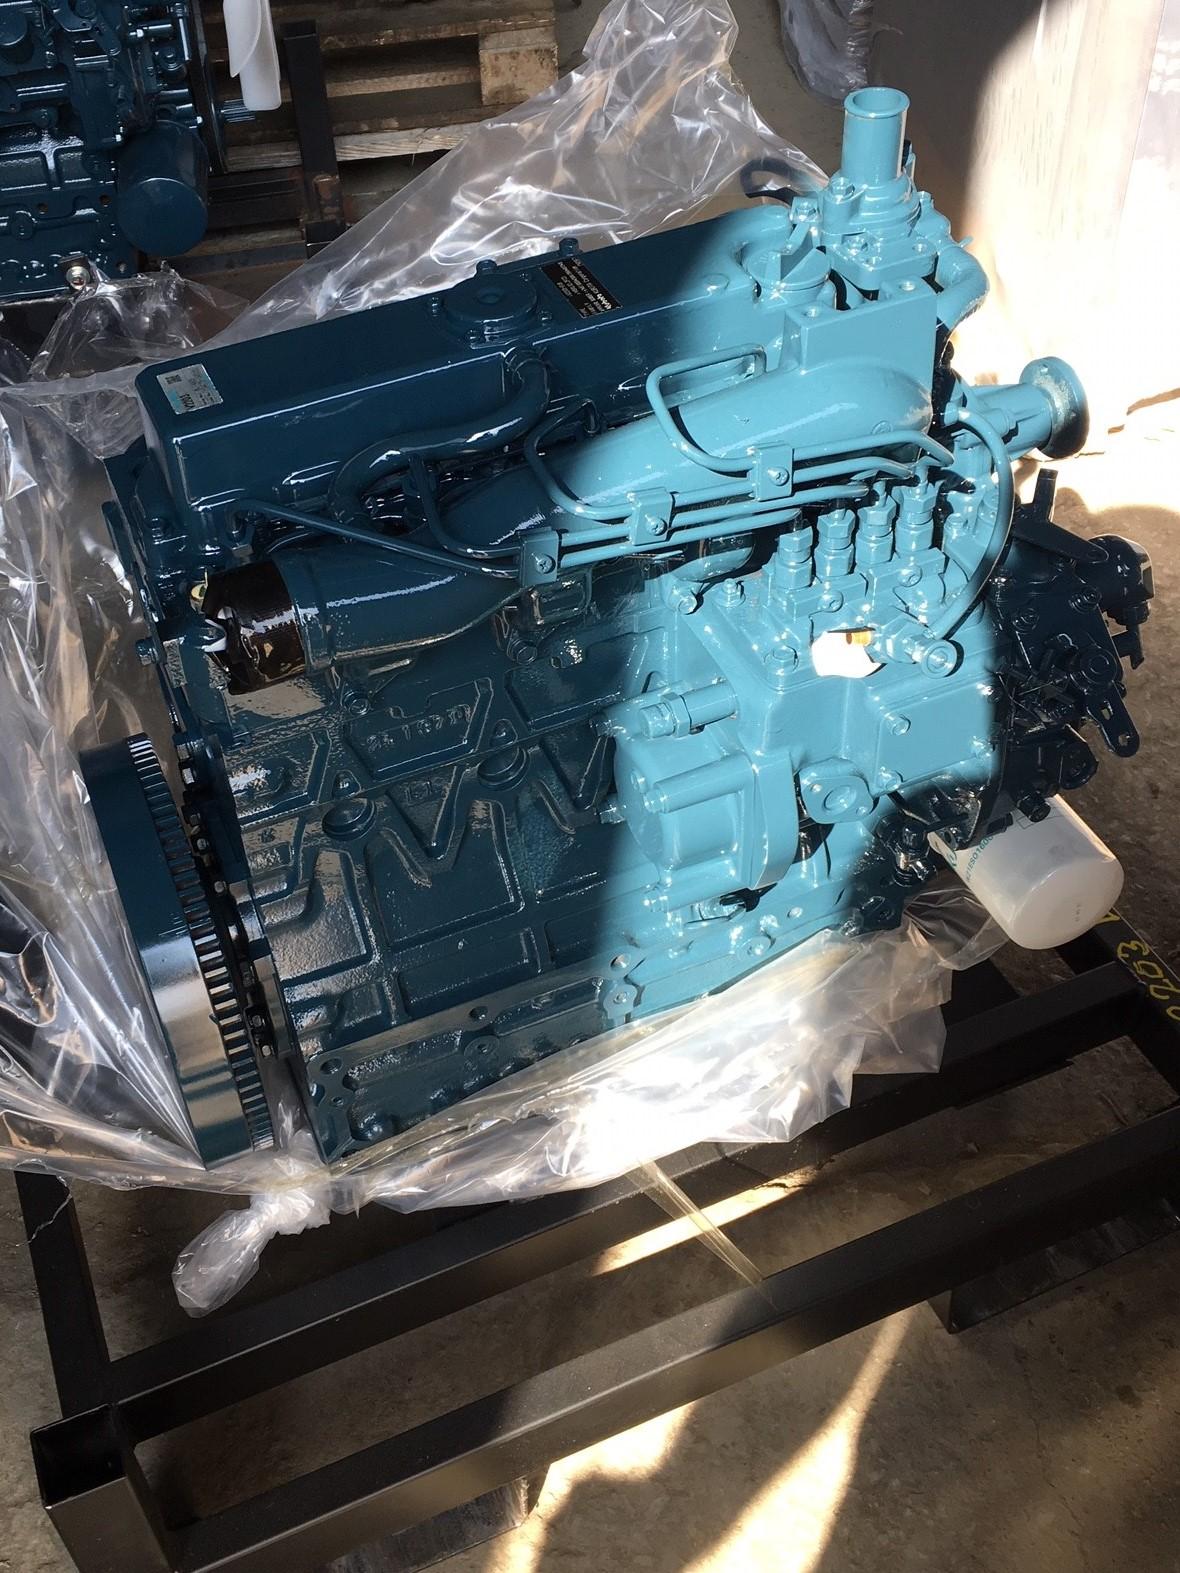 KUBOTA V2203 USED LOW HOUR USED ENGINE SUIT